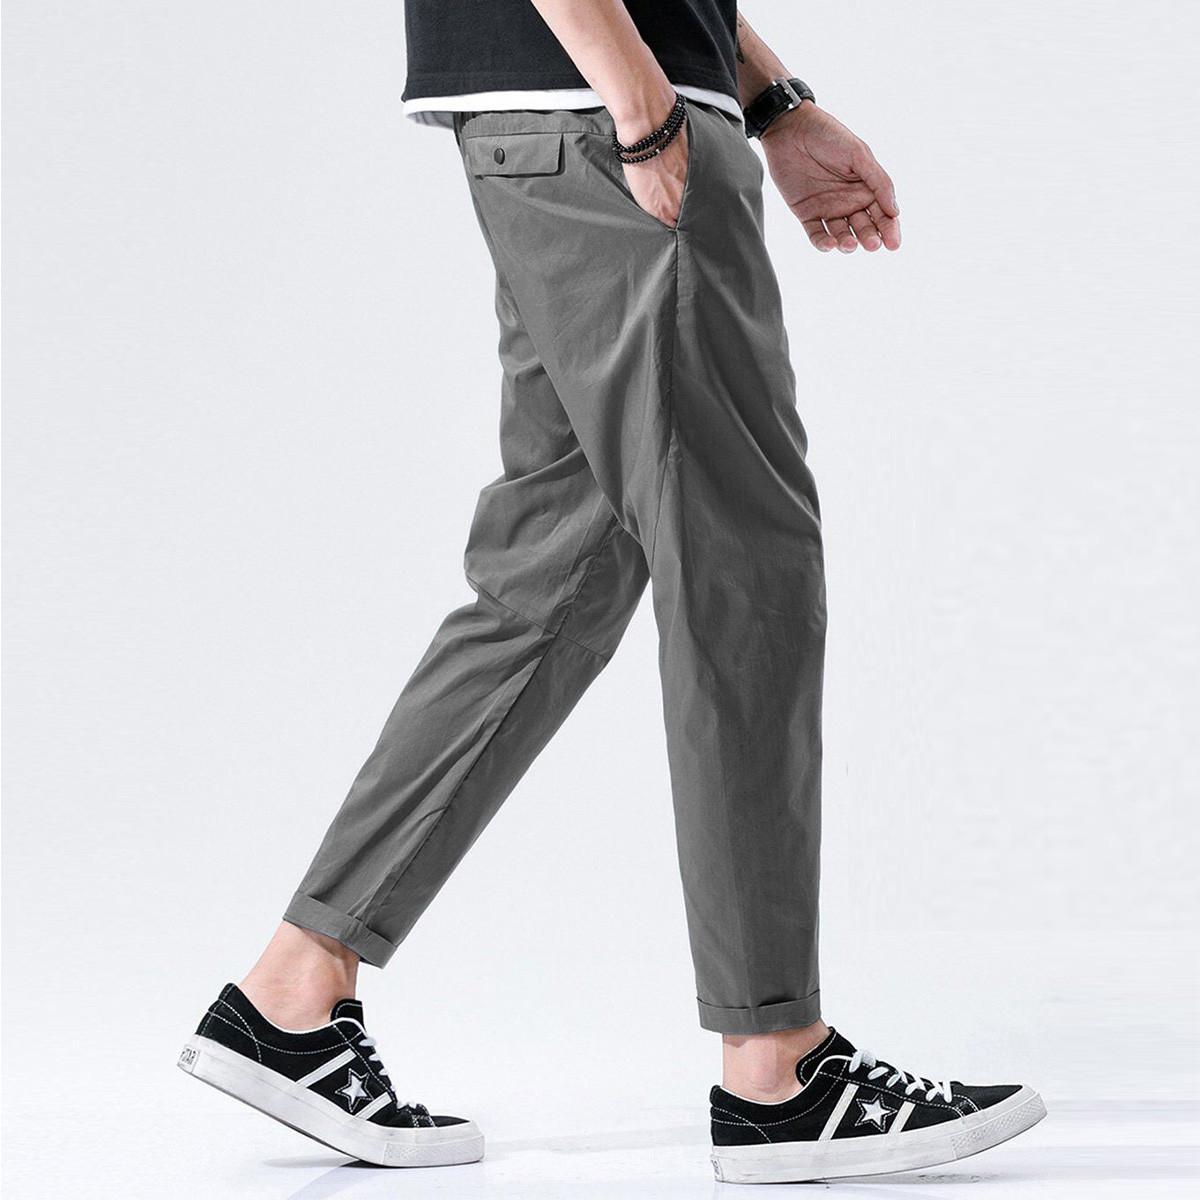 KM KILO KMMETERS2019新品时尚休闲简约薄款男式休闲裤K648J33081116